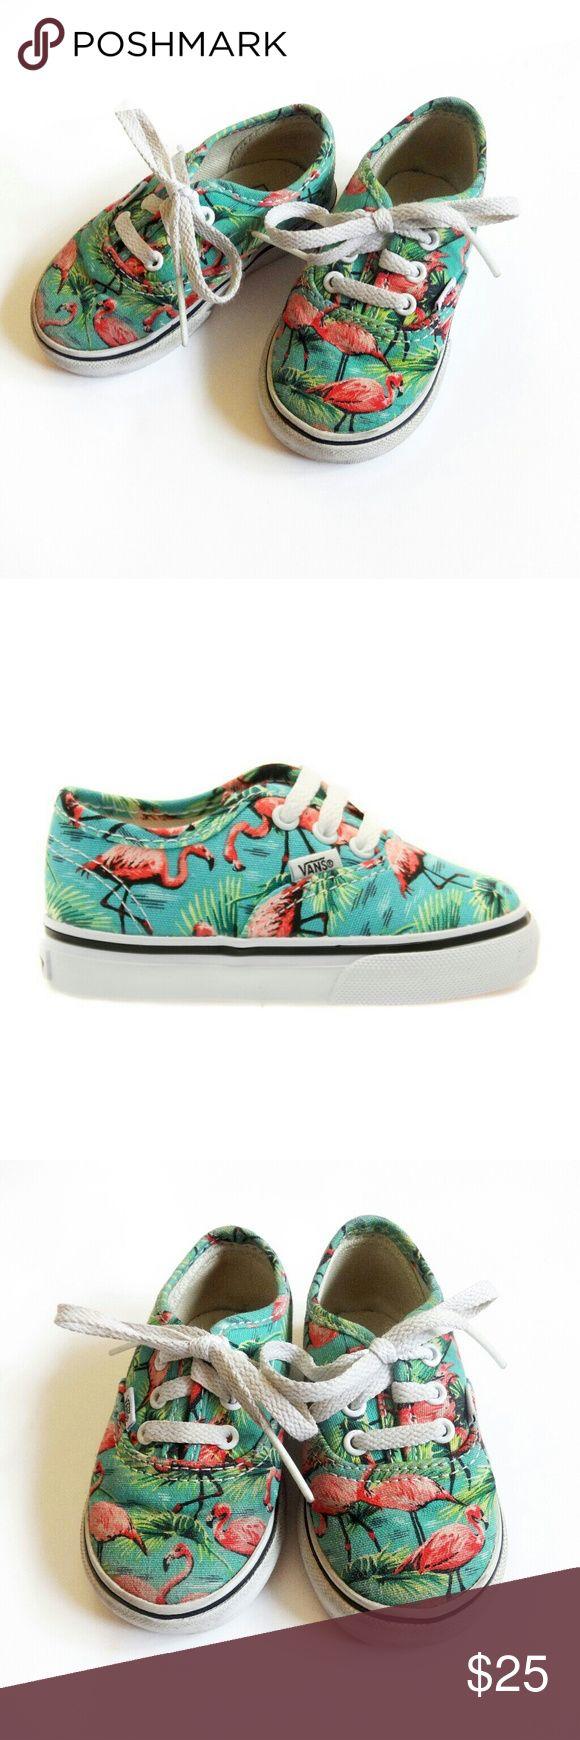 Flamingo Vans PRICE FIRM Bundle for discount! Excellent condition. Size 5 Toddler. Unisex! Vans Shoes Sneakers